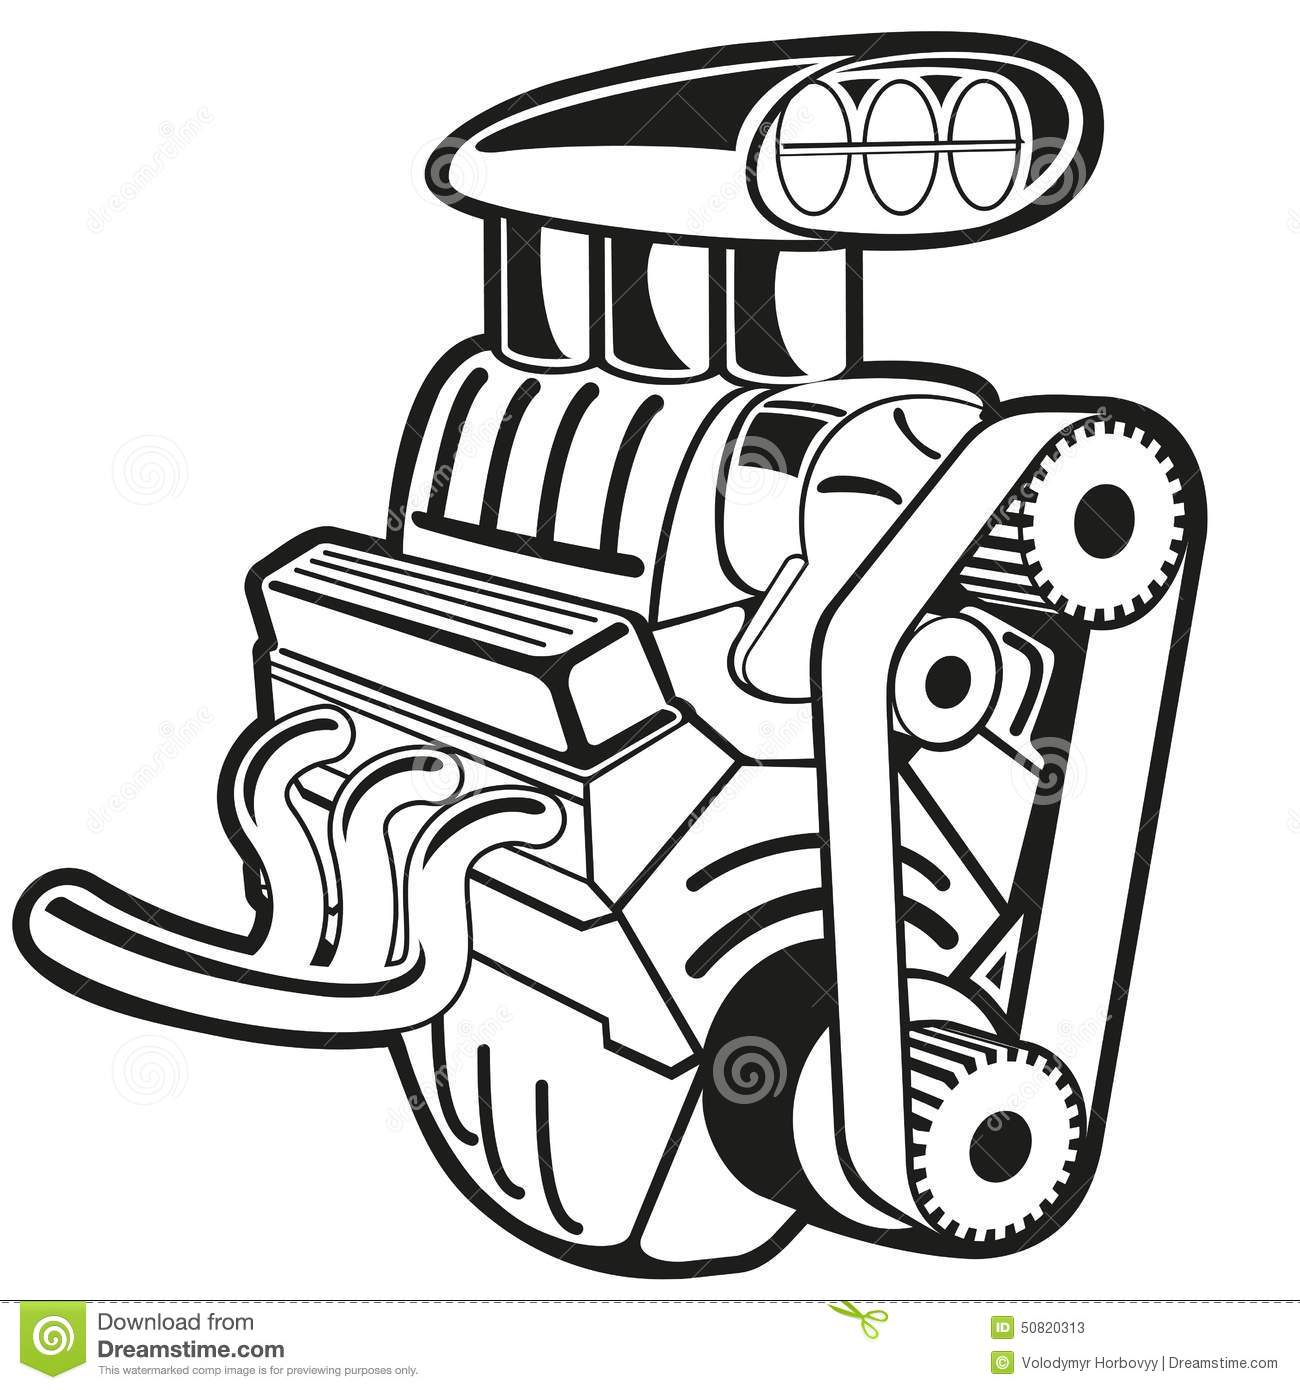 Motor clipart #8, Download drawings